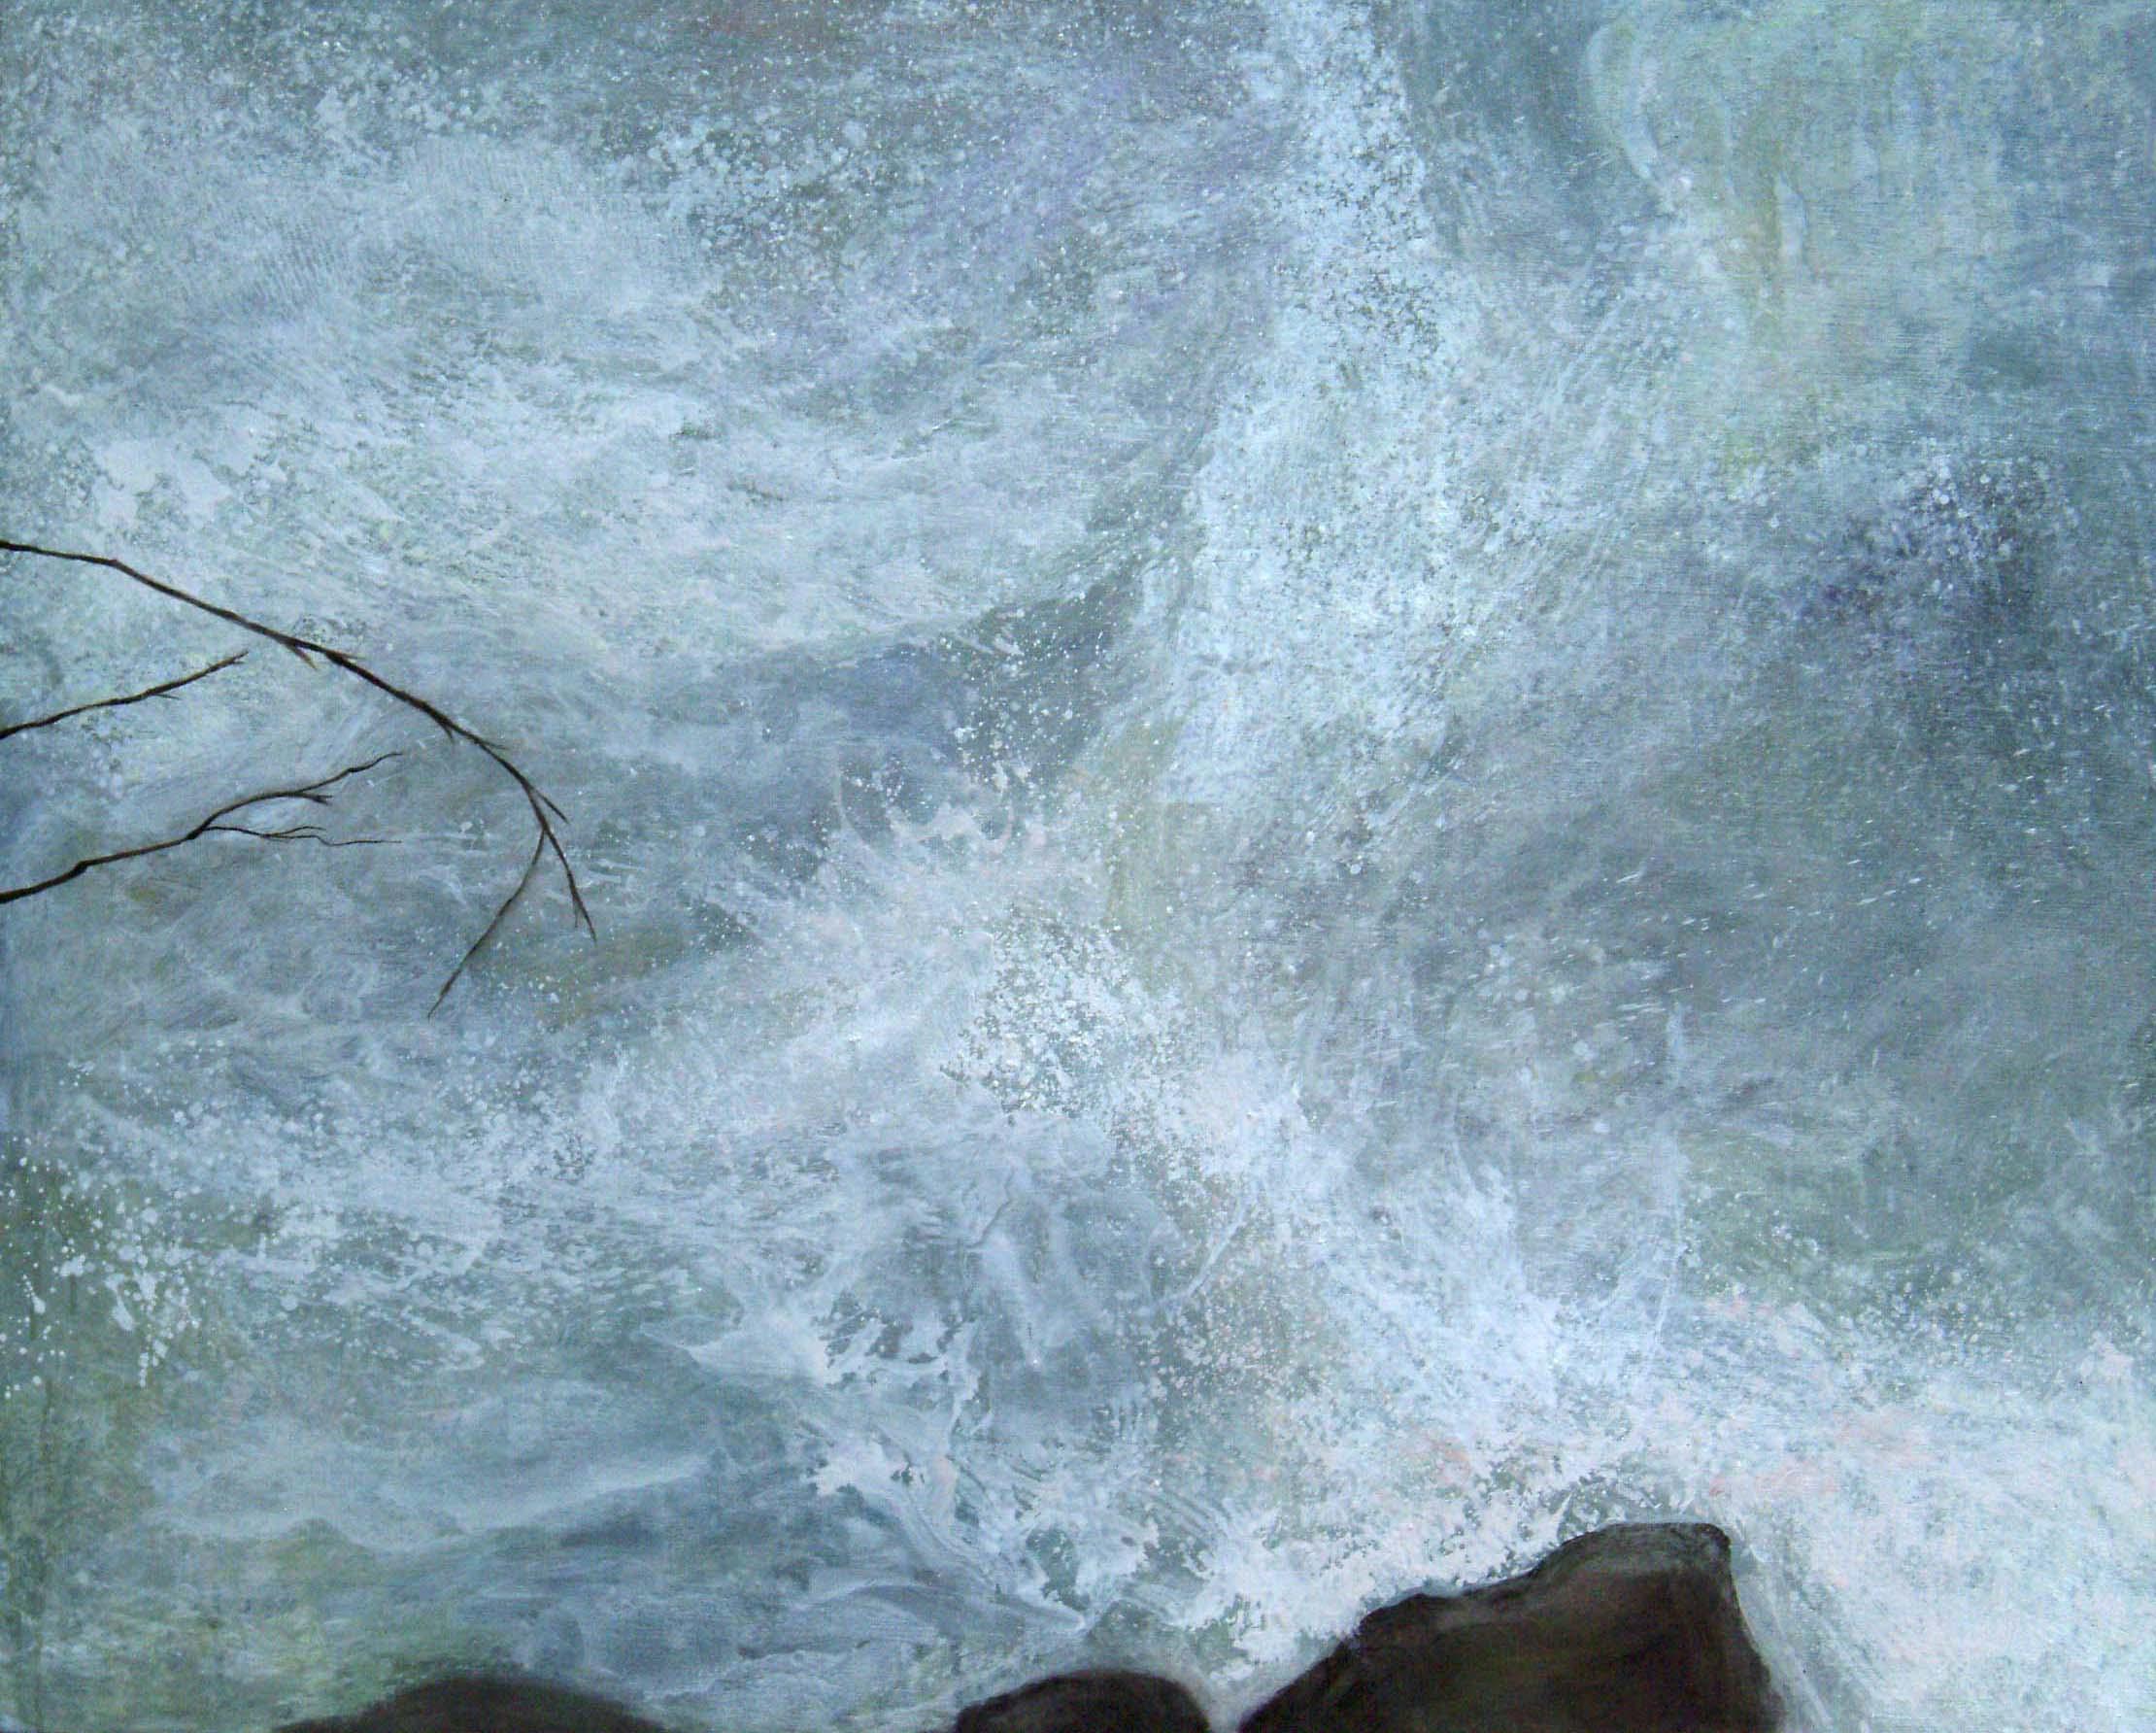 A torrential river